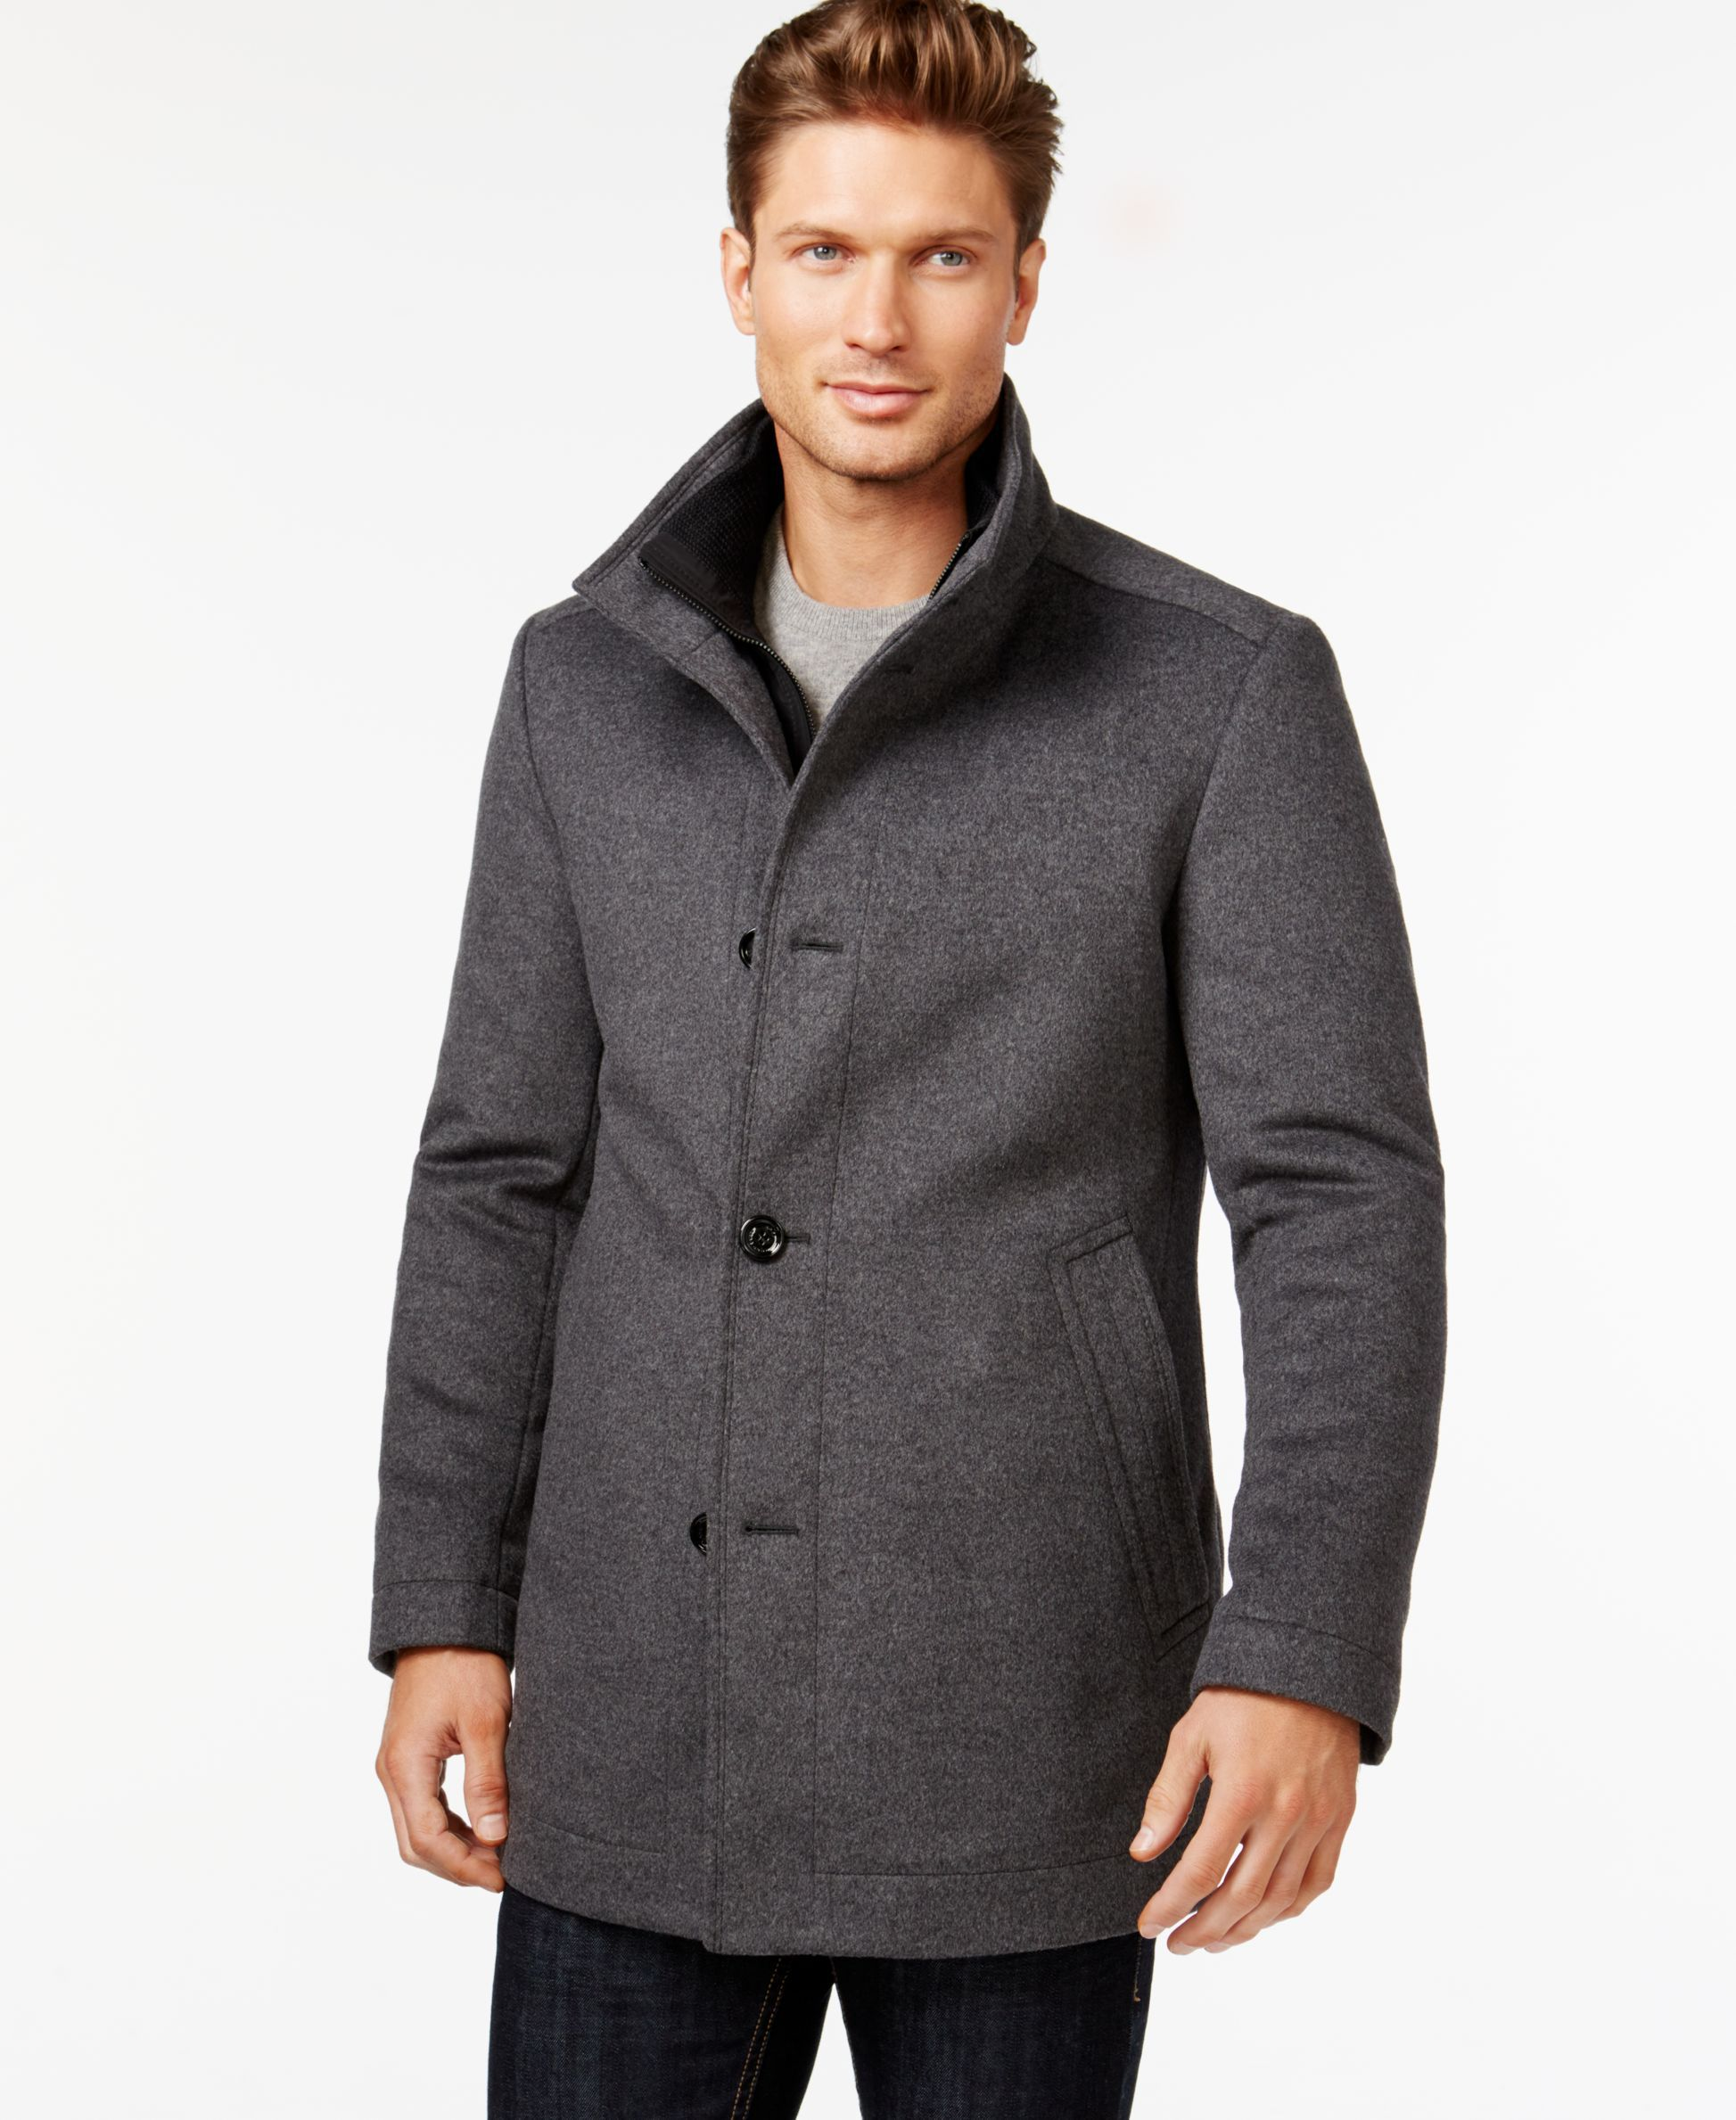 Boss Hugo Boss Coxtan Wool And Cashmere Coat Coats Jackets Men Macy S Cashmere Coat Hugo Boss Cashmere [ 2378 x 1947 Pixel ]